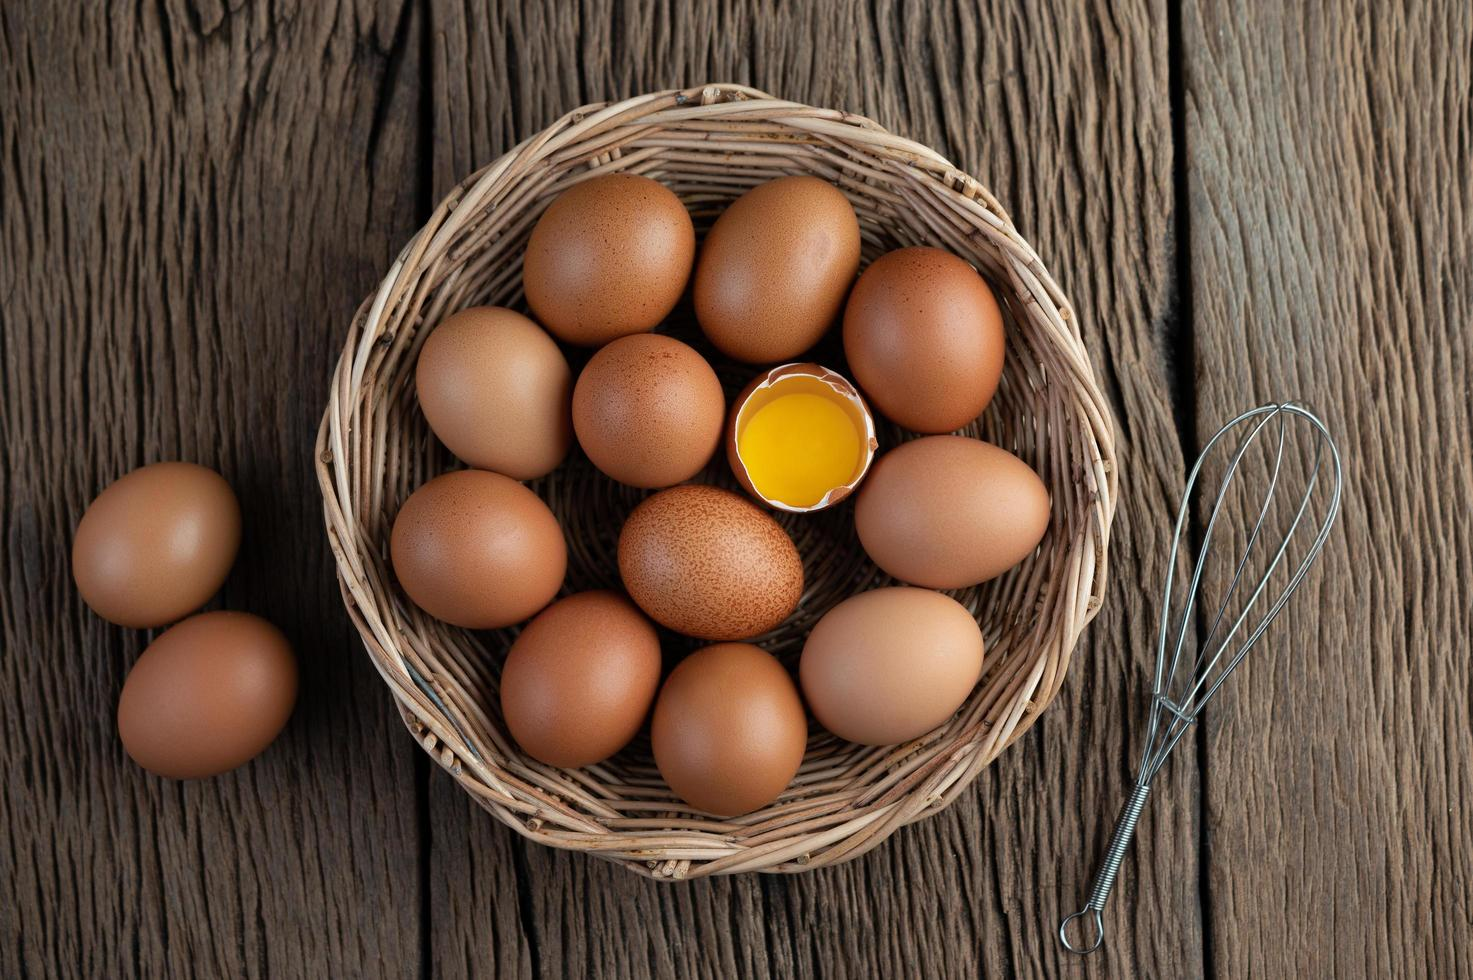 legde eieren in een houten mand foto